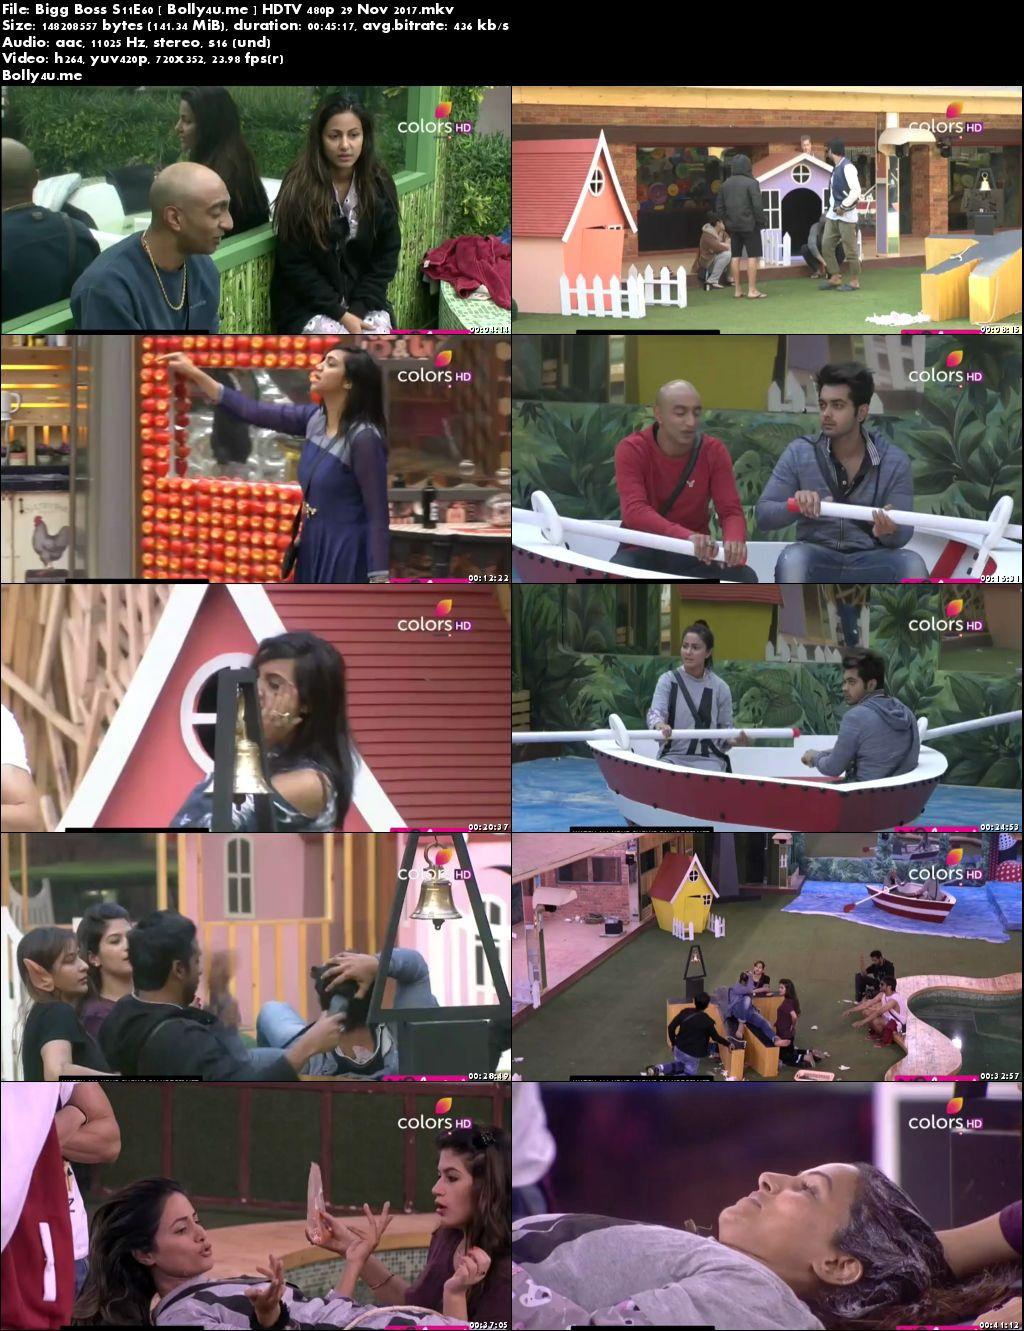 Bigg Boss S11E60 HDTV 140MB 480p 29 November 2017 Download